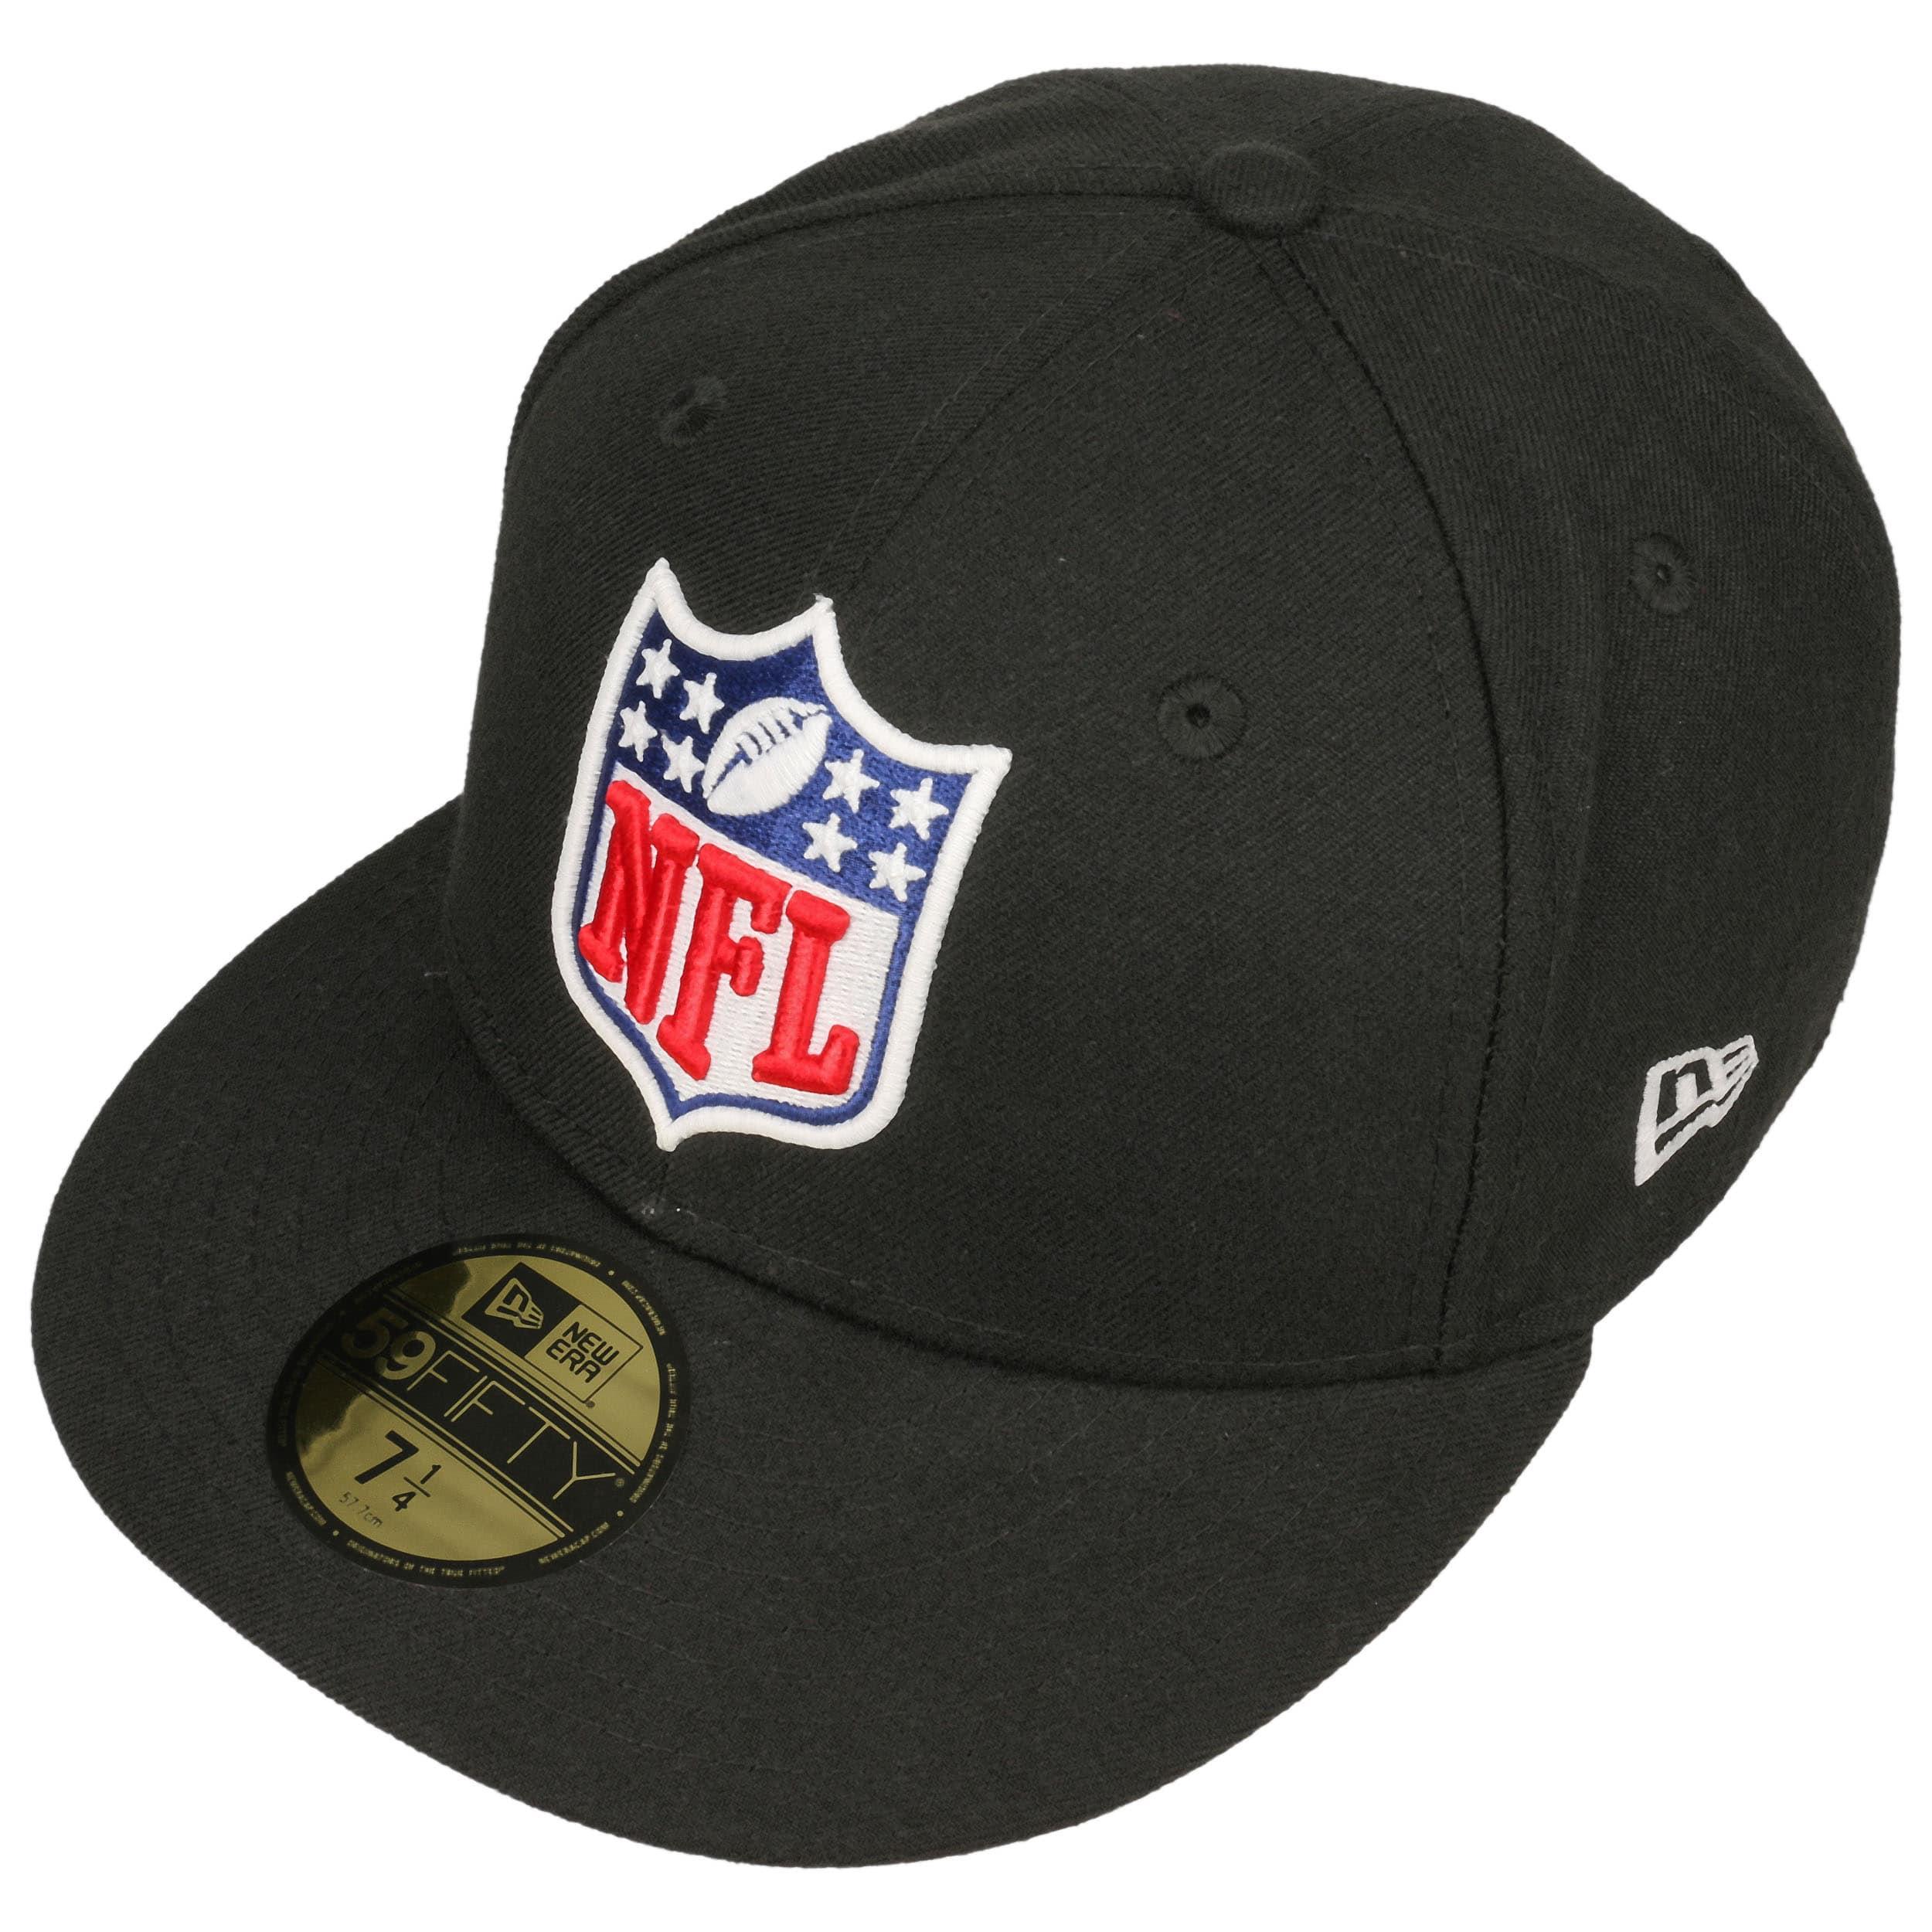 59Fifty NFL Shield Cap by New Era, EUR 25,95 gt; Hats, caps  beanies shop online  Hatshopping.com